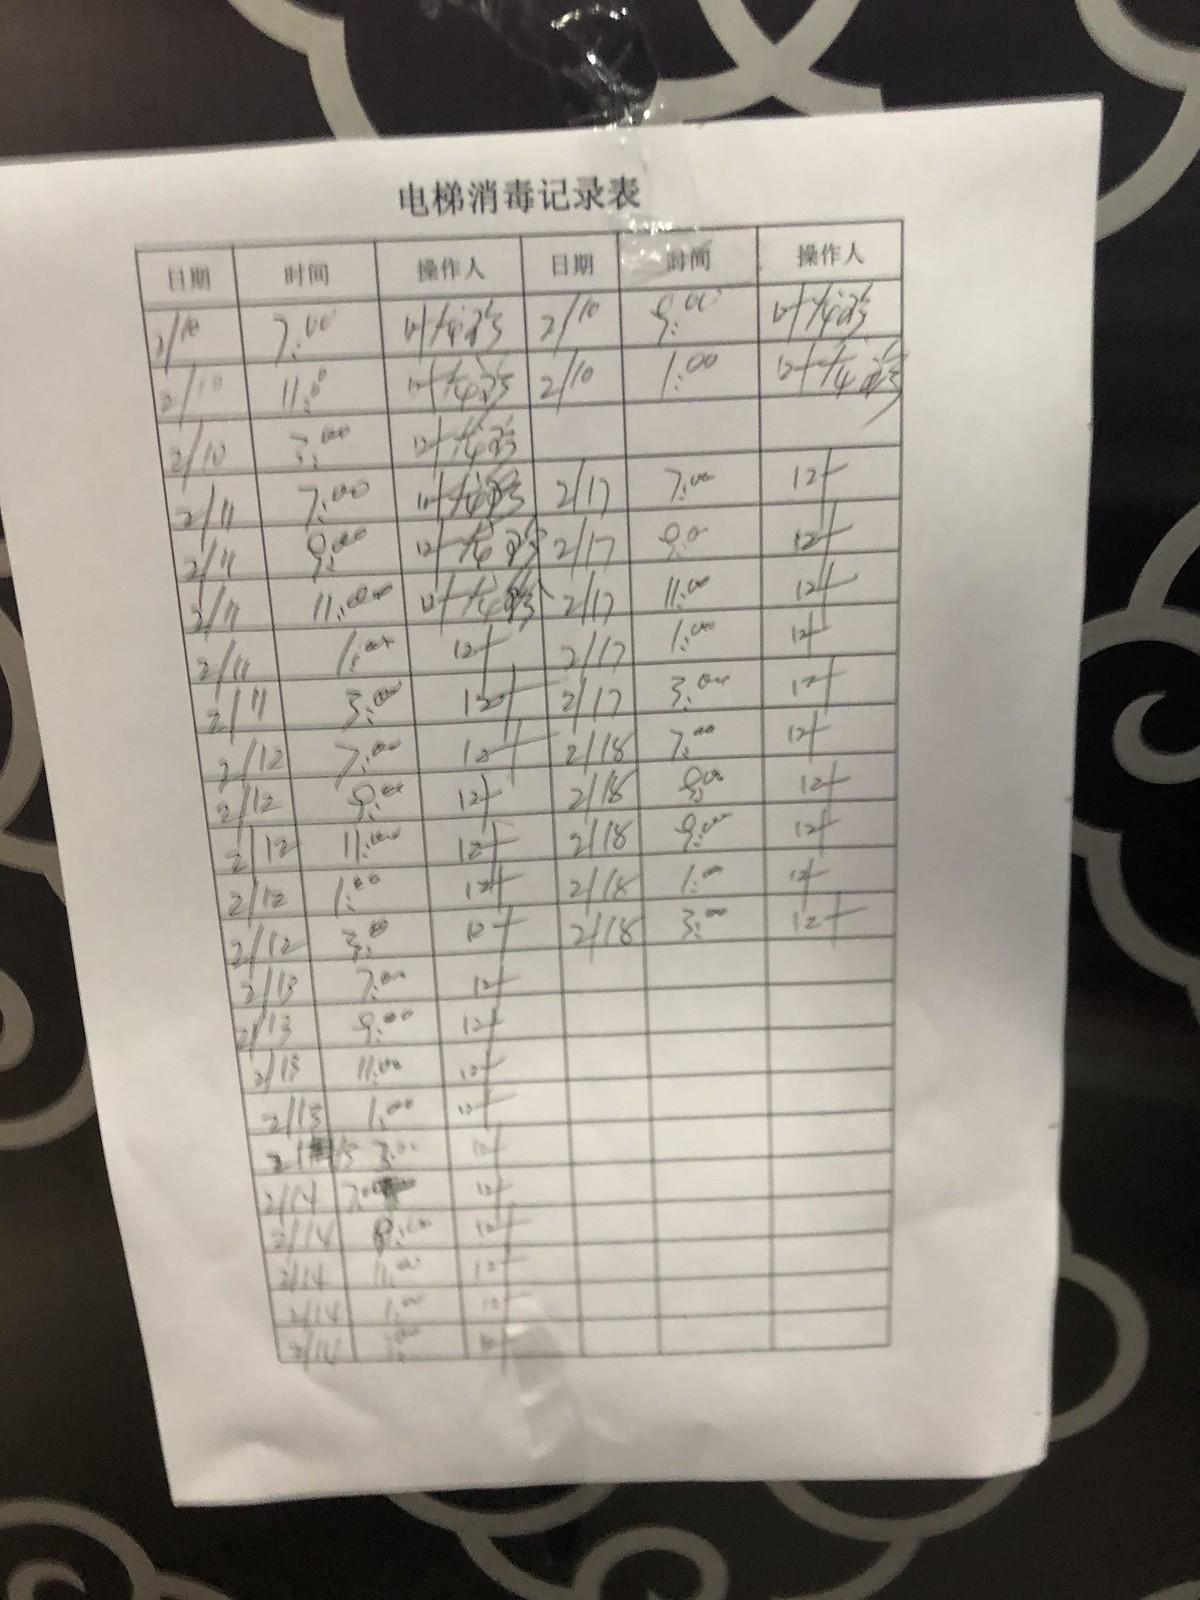 Elevator Cleaning Schedule